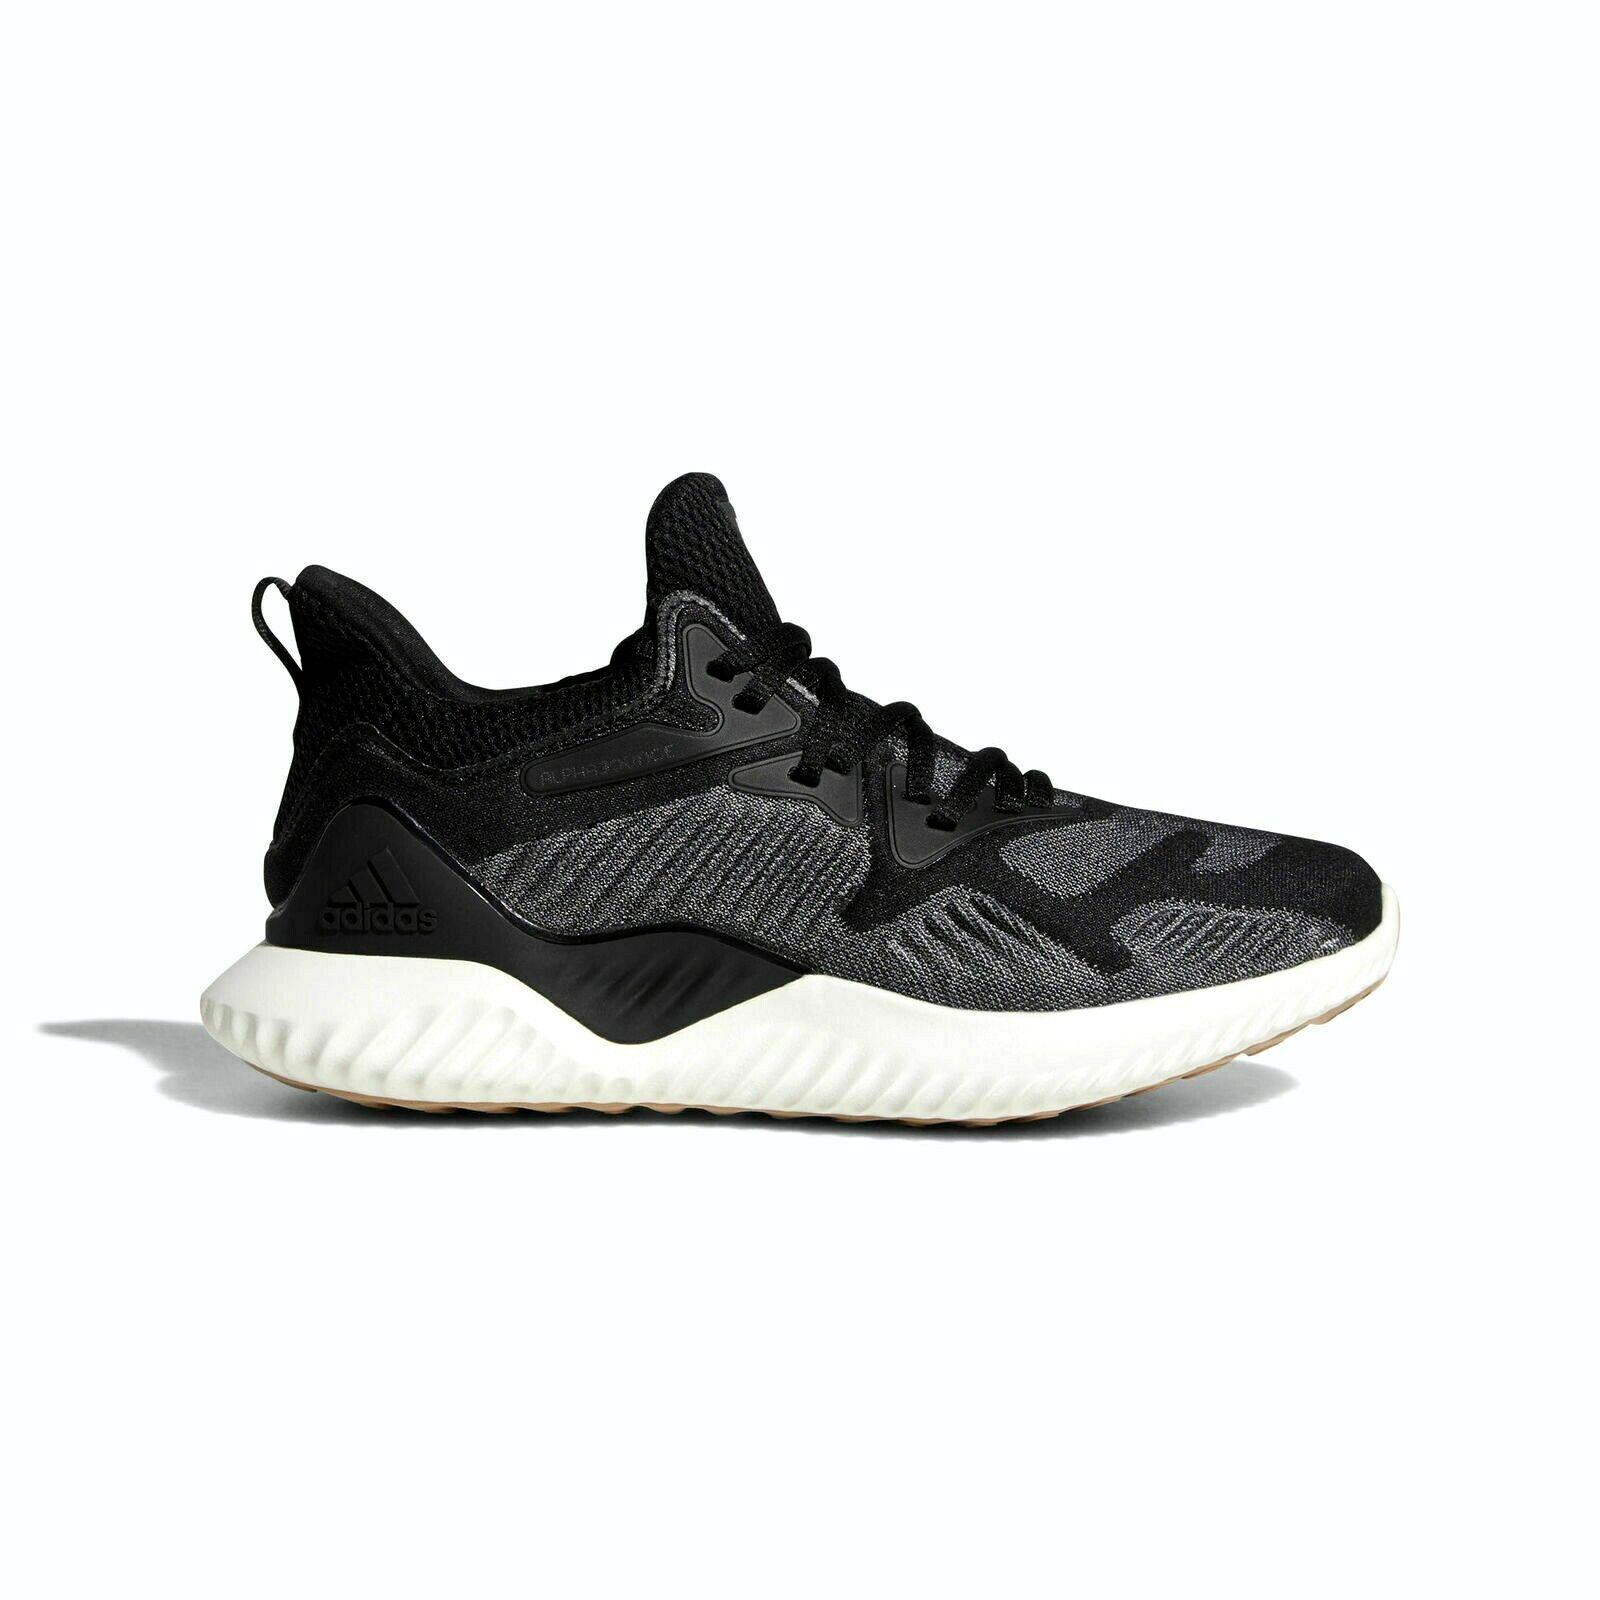 Adidas para mujer zapatosperformance alphabounce más allá de Gimnasio Running Zapatos